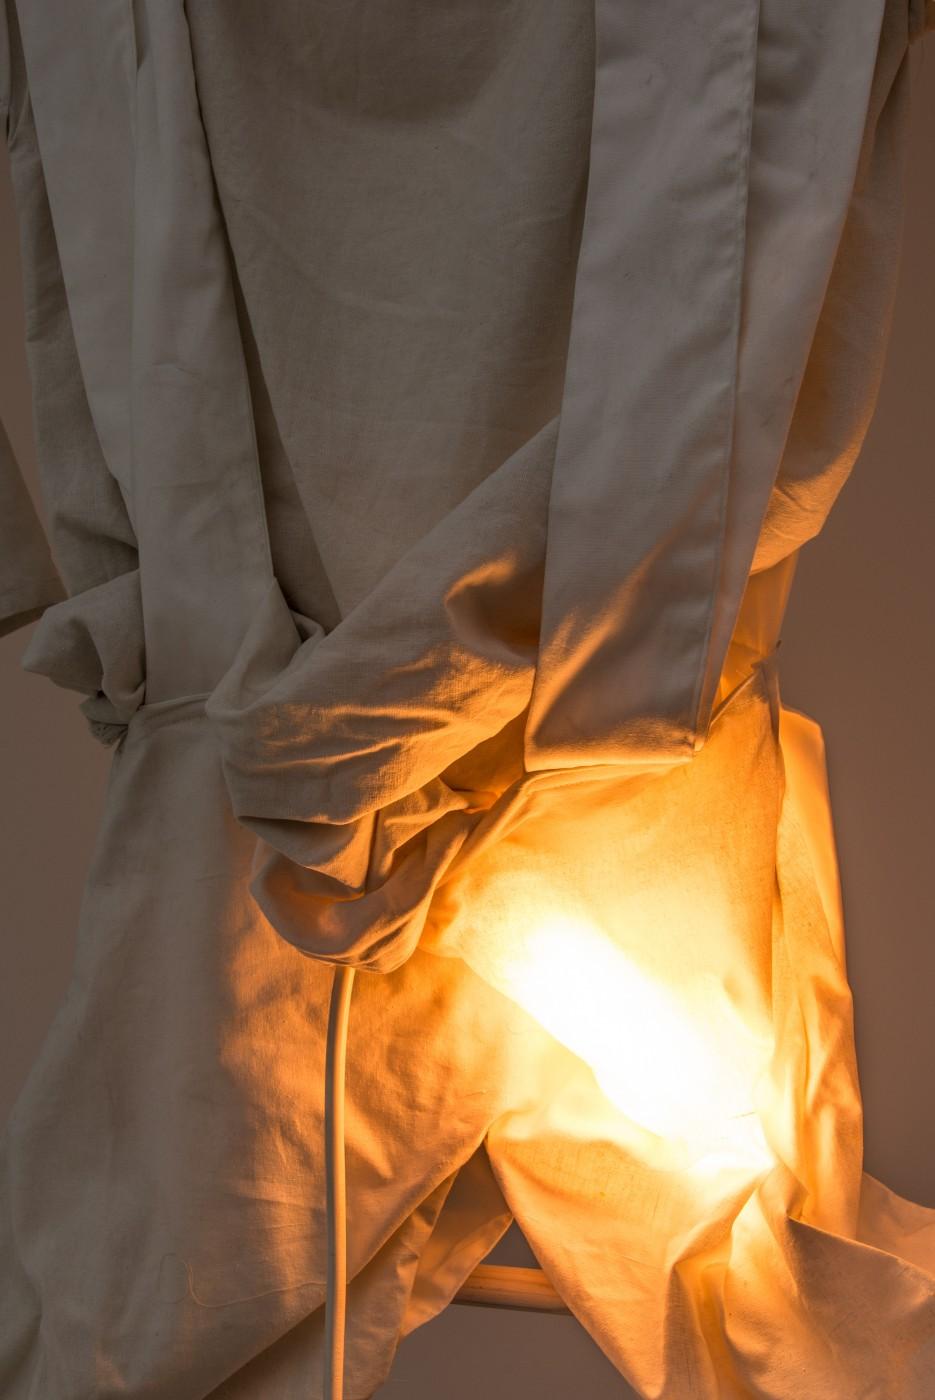 SORRY  My Shape</I> (detail), 2018 Cotton, rope, light, wood 130 x 80 x 20 cm / 51.2 x 31.5 x 7.9 in  MÉLANIE MATRANGA